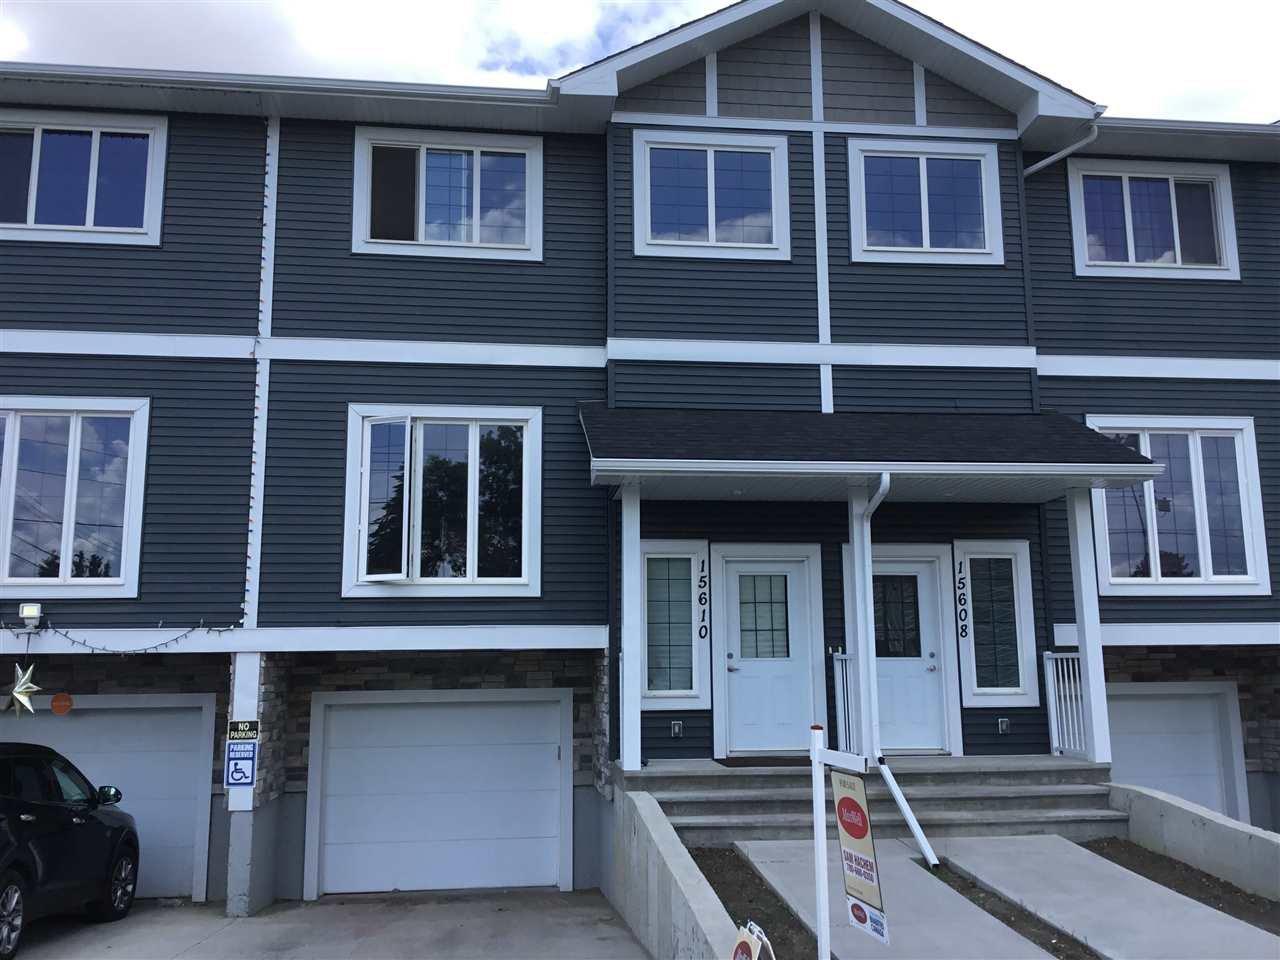 Main Photo: 15610 97 Avenue in Edmonton: Zone 22 Townhouse for sale : MLS®# E4163866